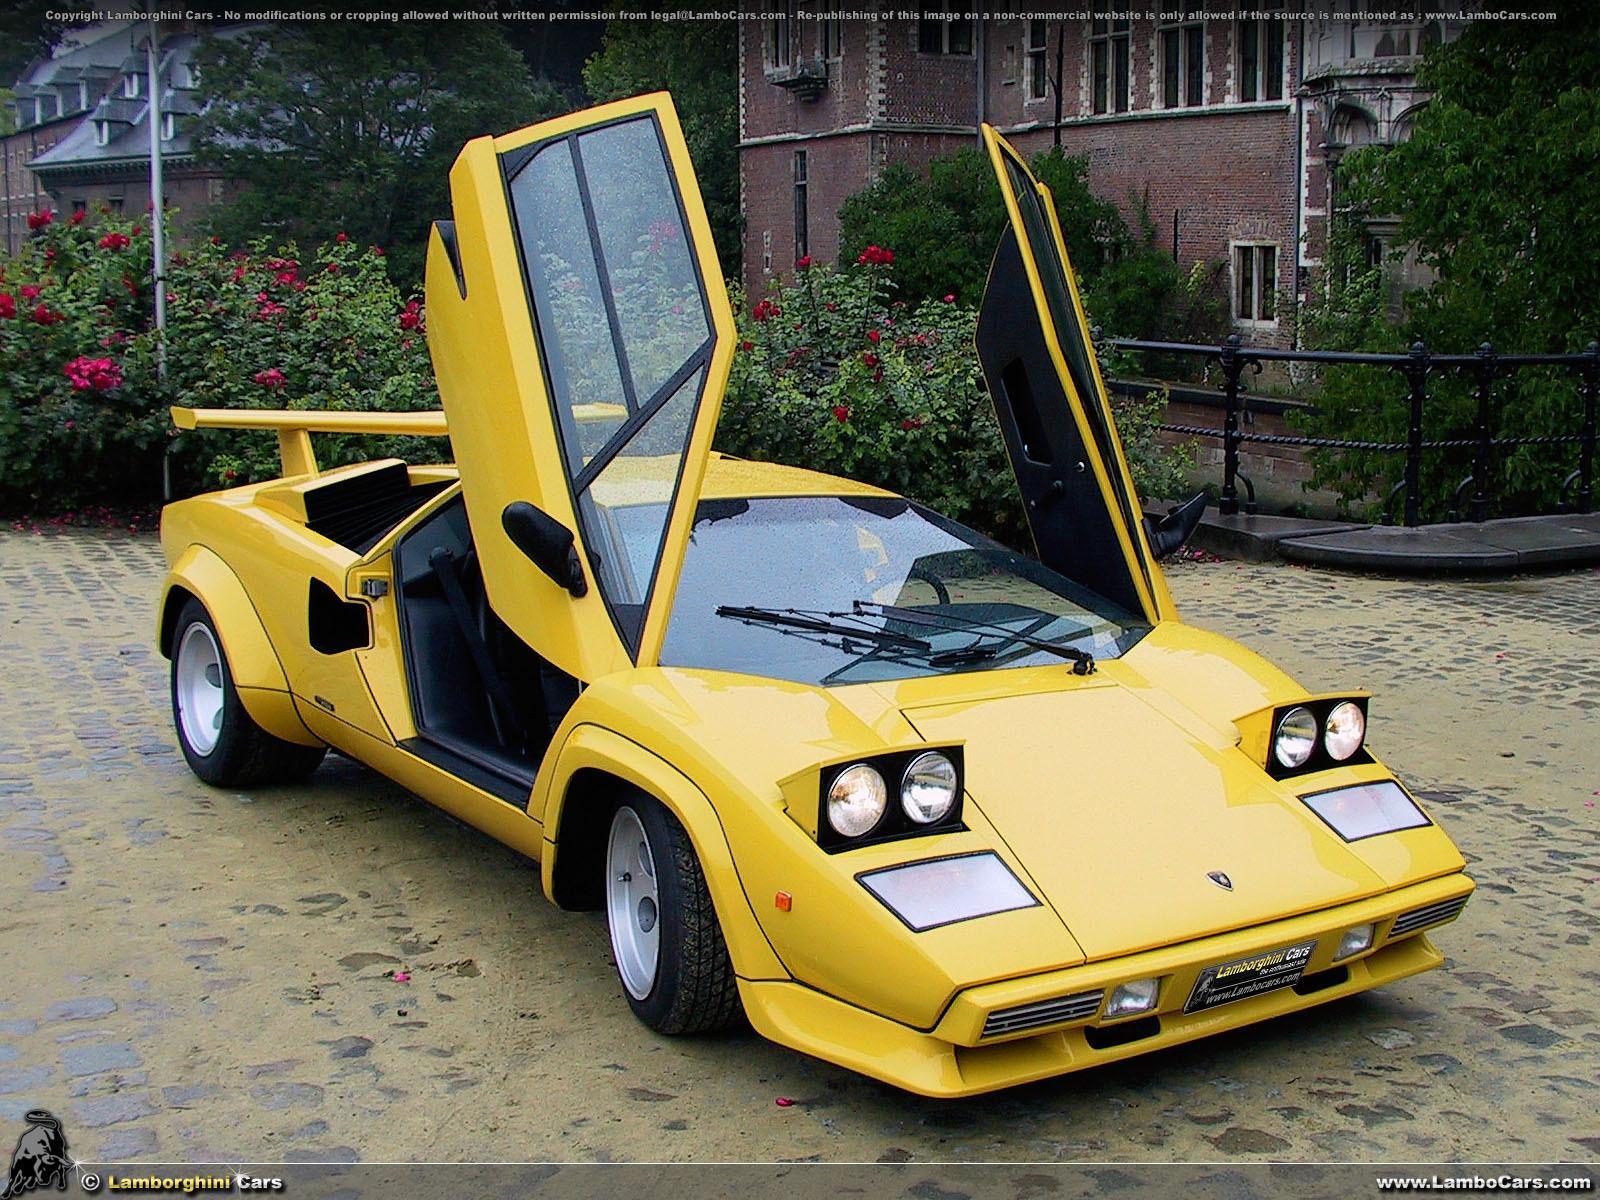 Lamborghini Countach Pop Up Lights